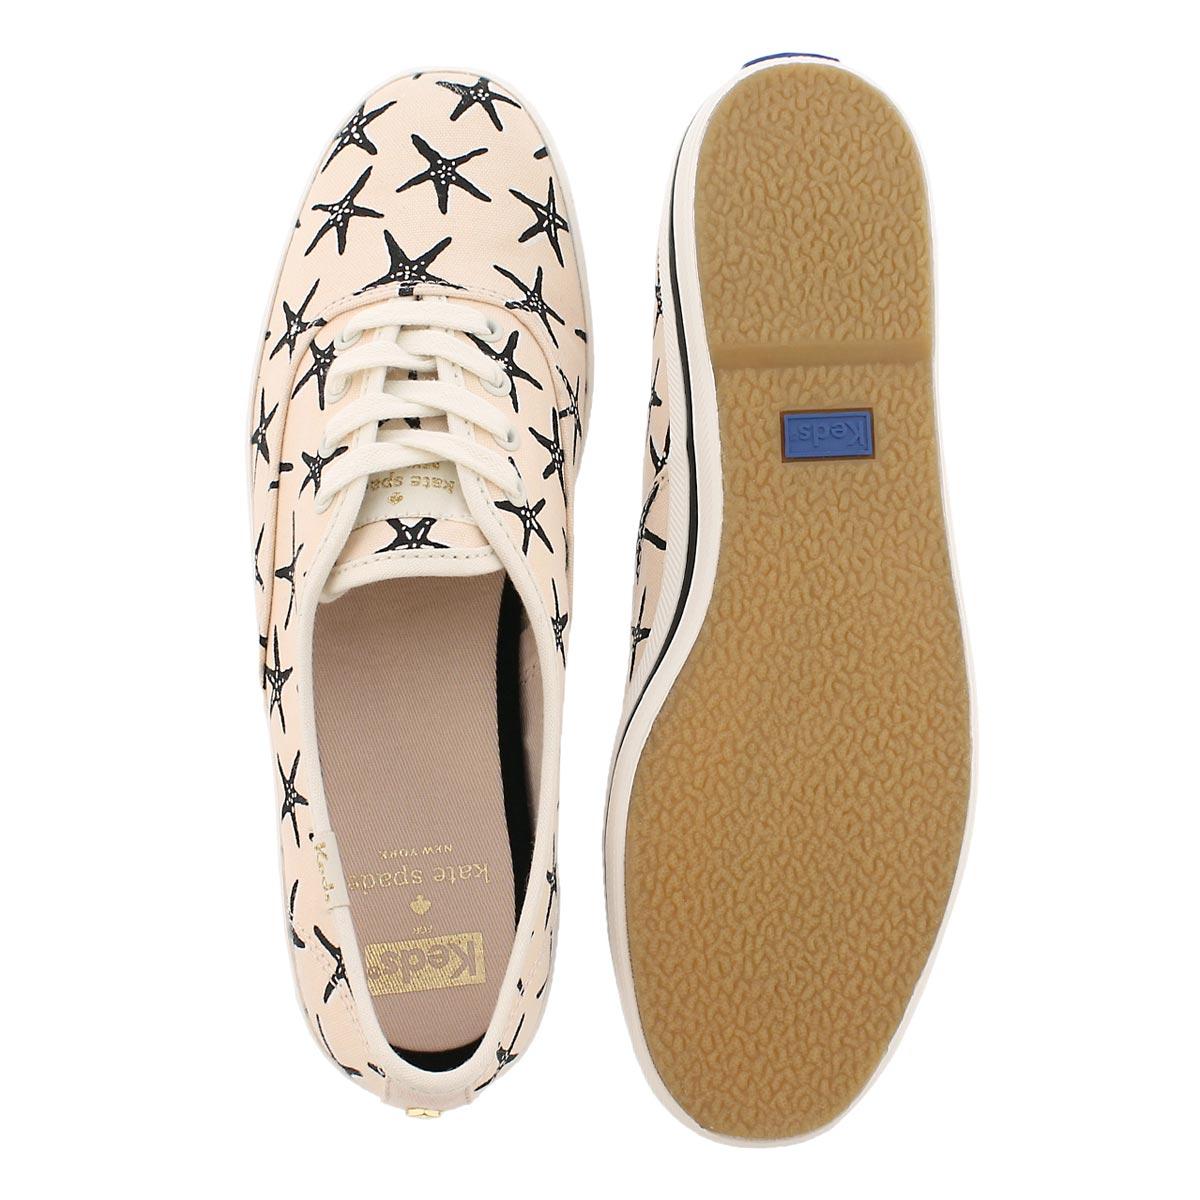 Lds Kate Spade lt pnk/black sneaker